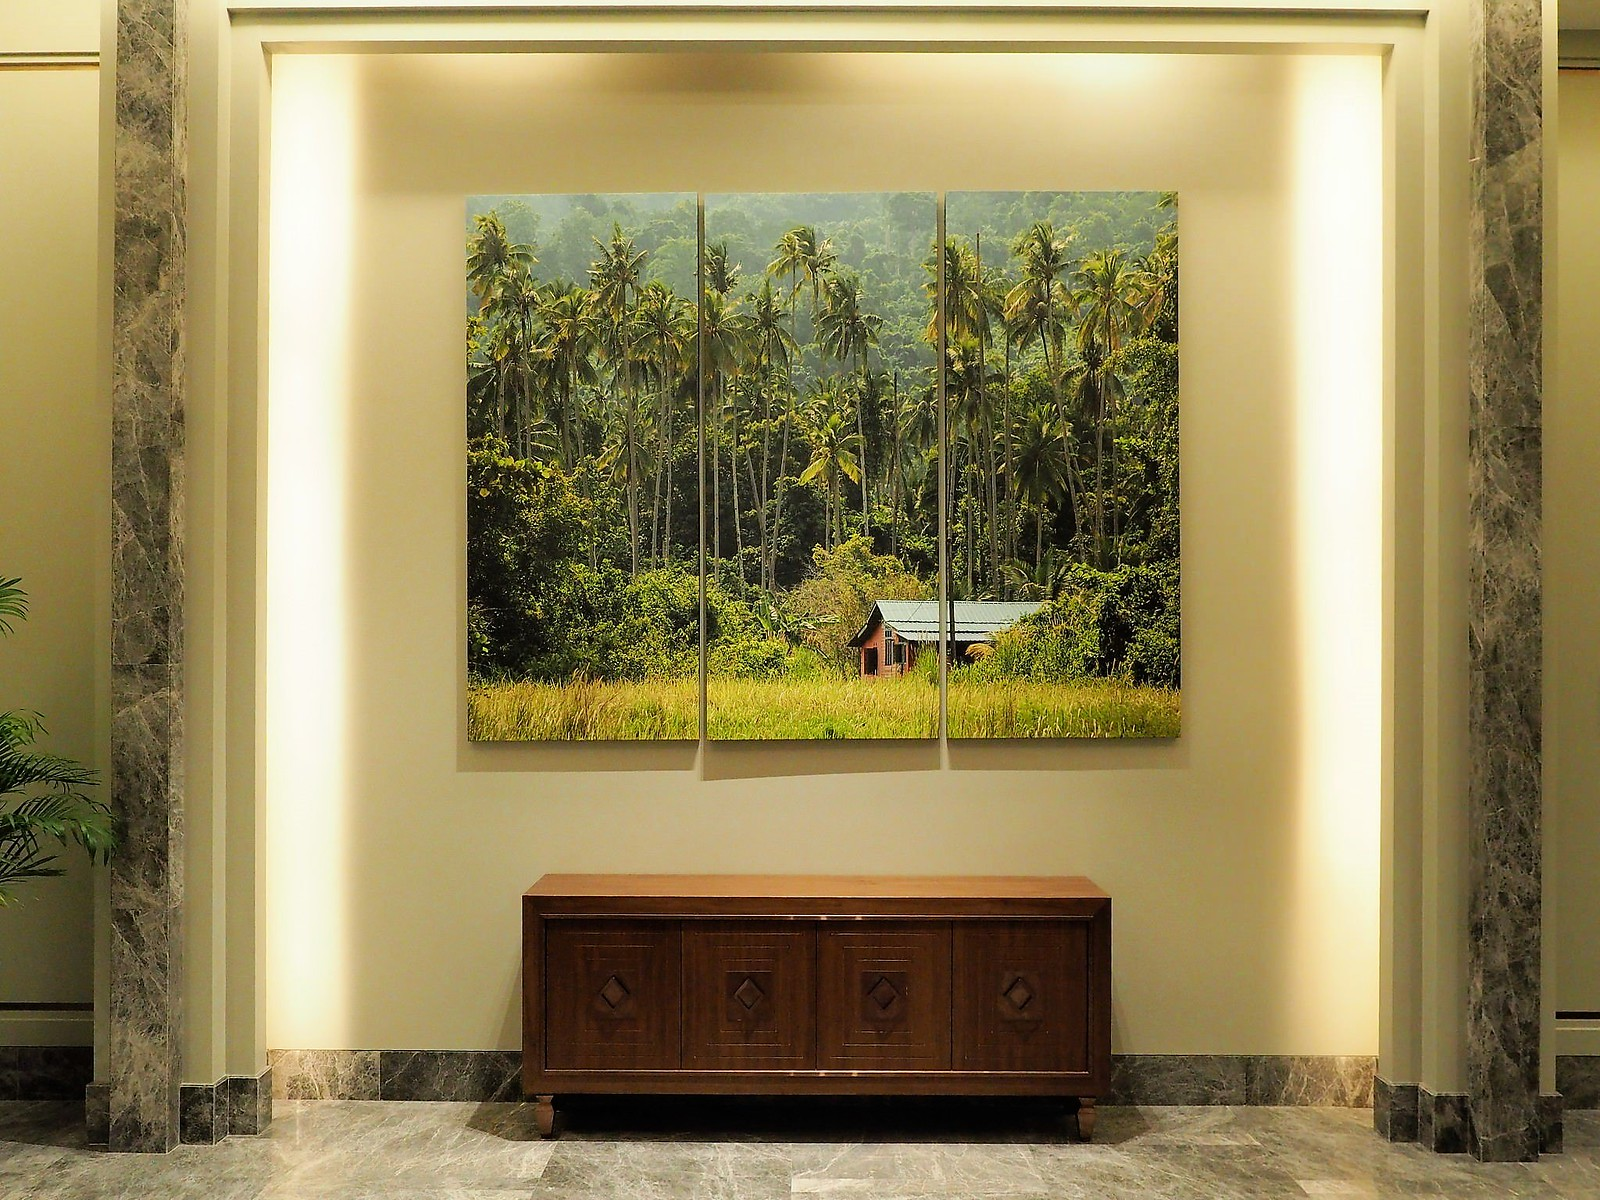 A nice photo at Sheraton Petaling Jaya Hotel